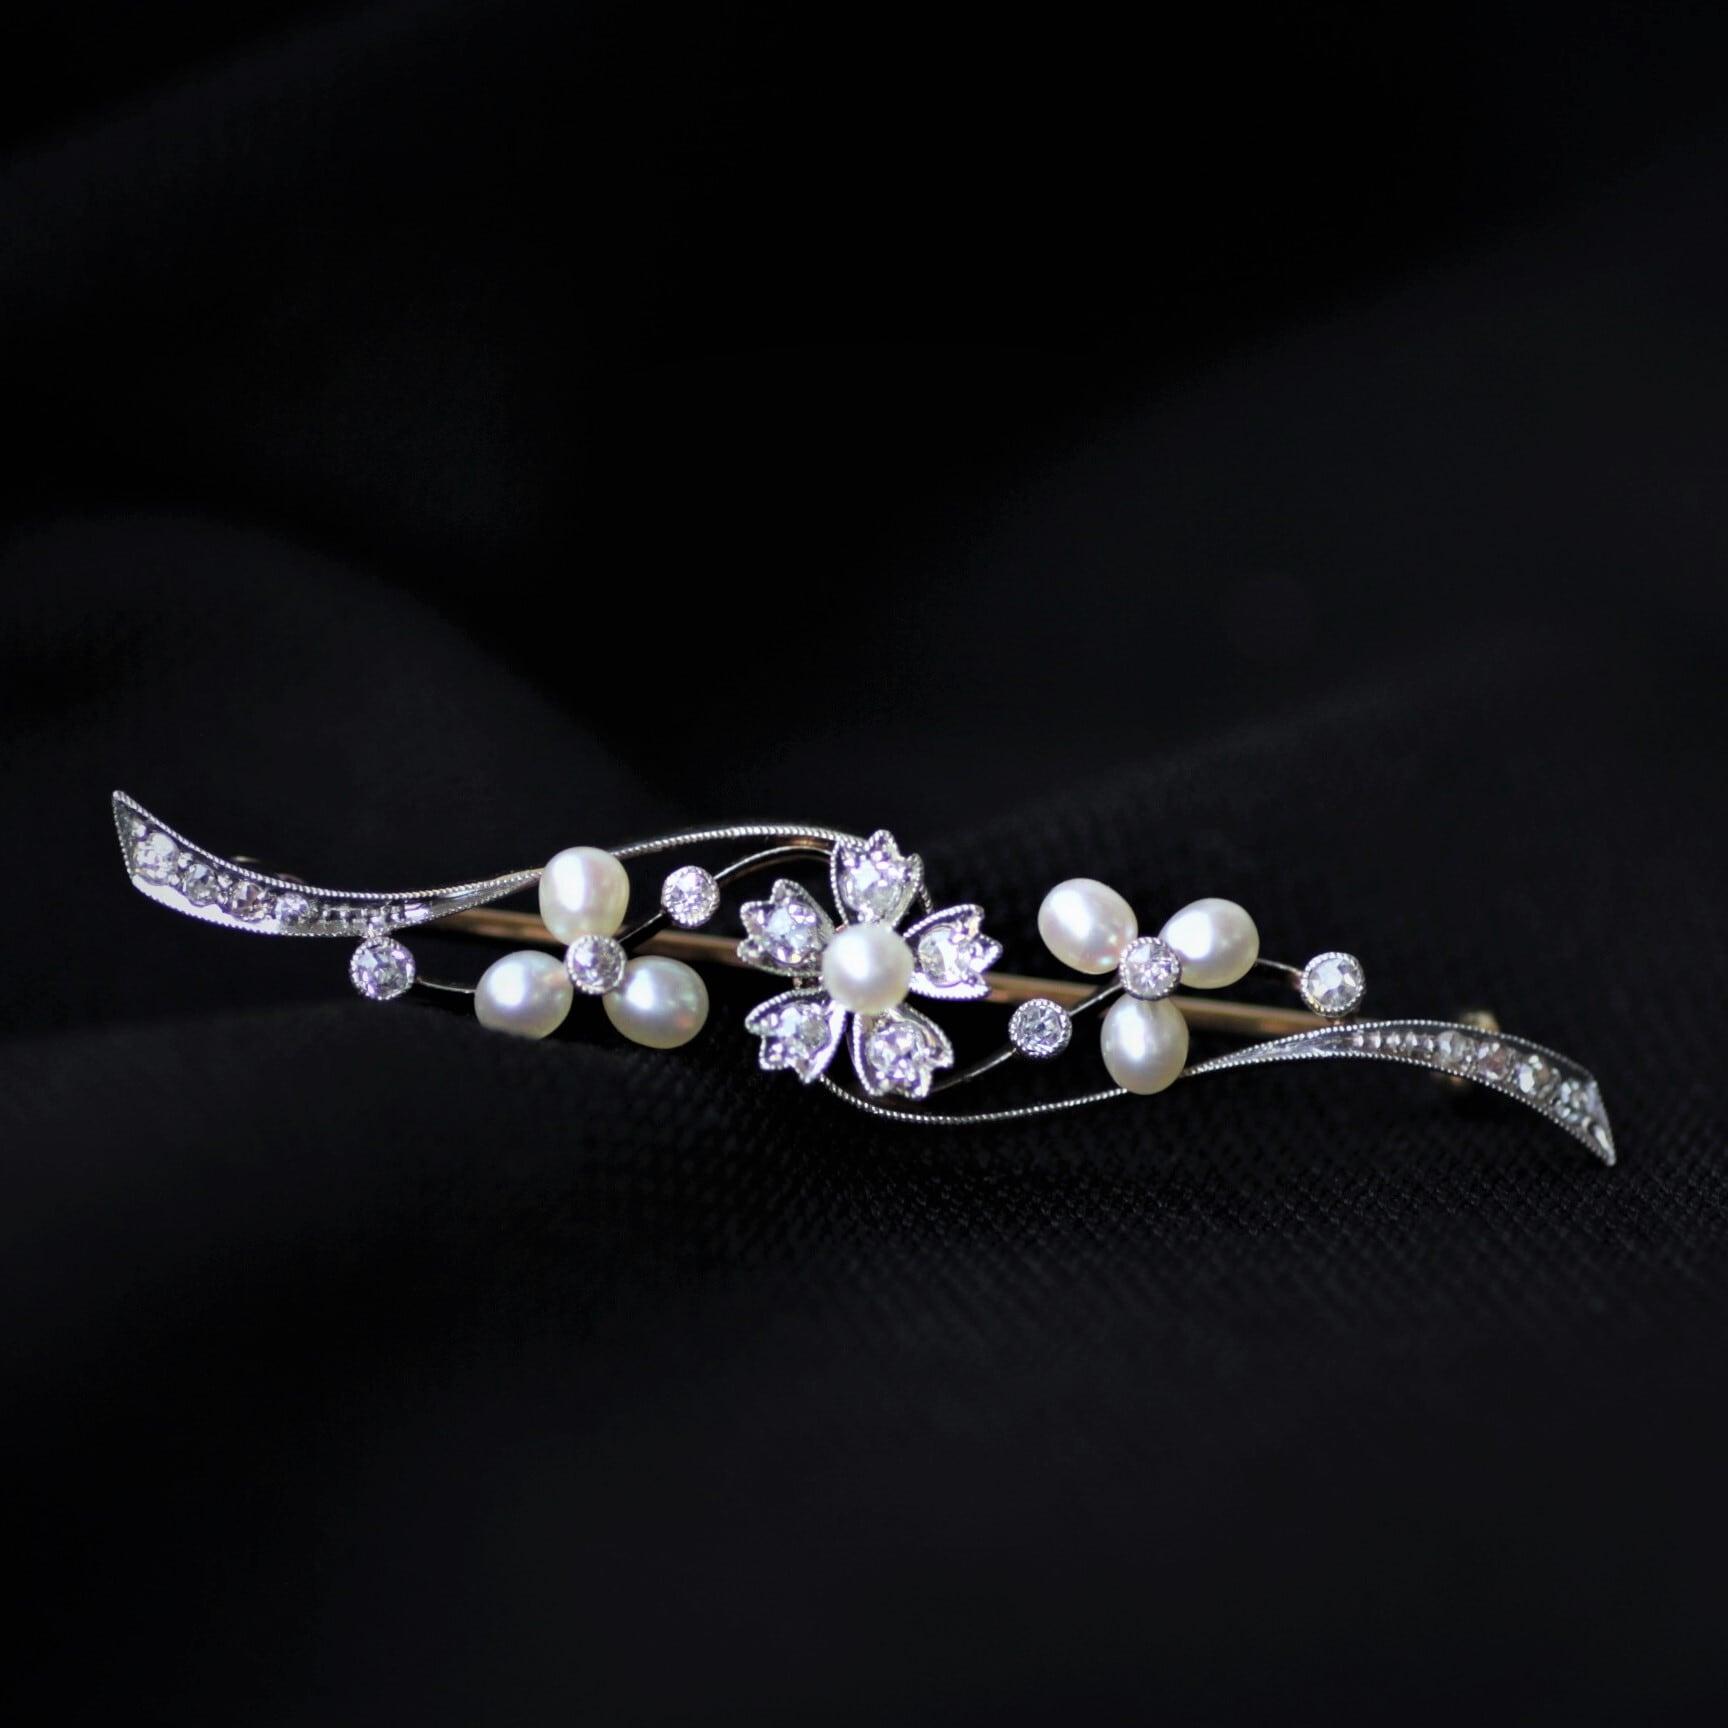 Pearl & Diamond Brooch パール & ダイヤモンド バー・ブローチ